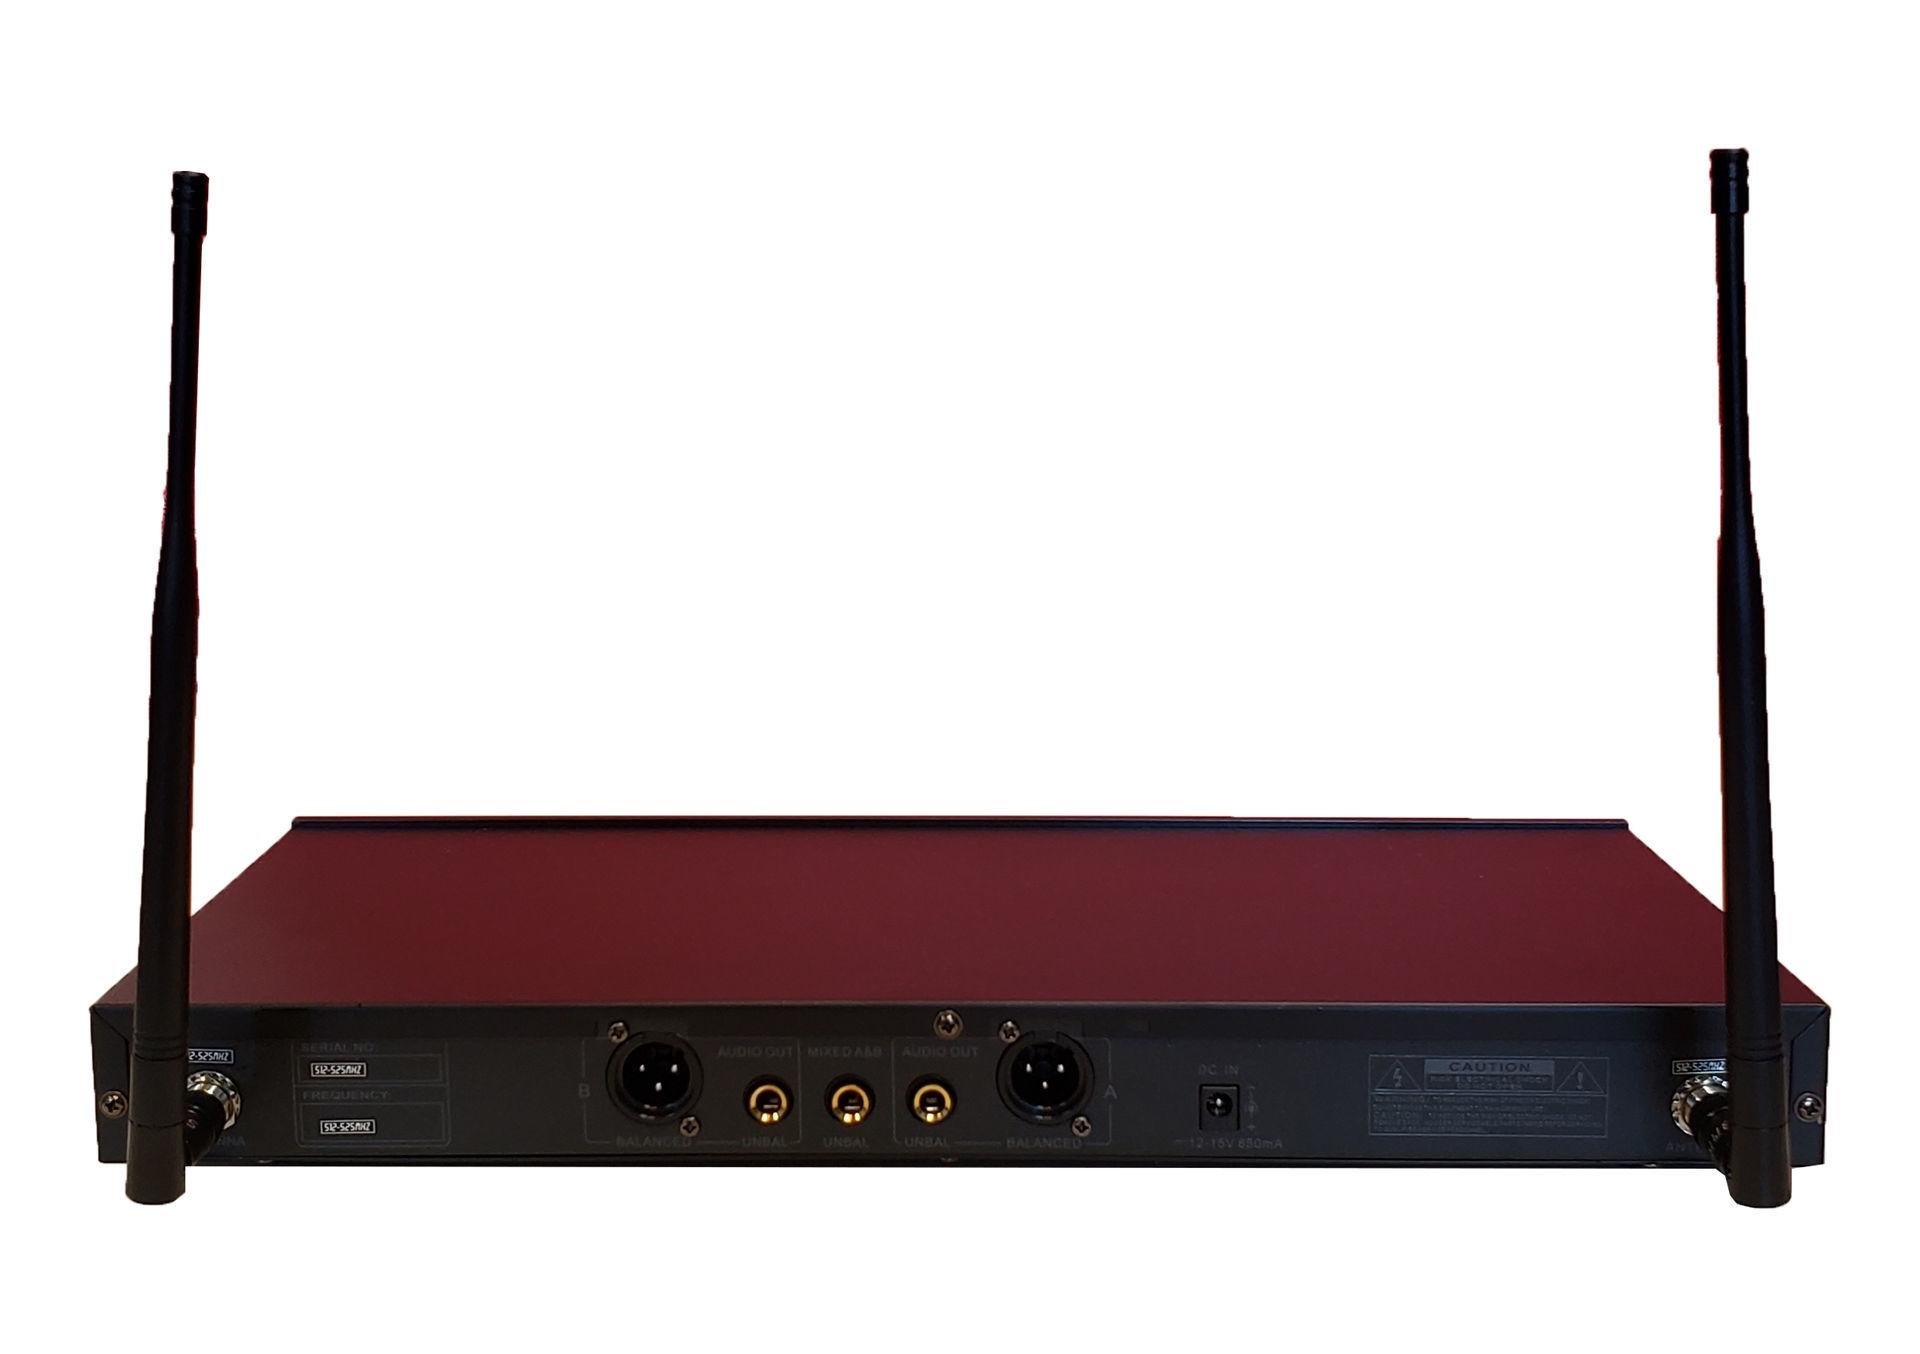 Picture of SSKaudio SSK-88 UHF Diversity Wireless Microphone